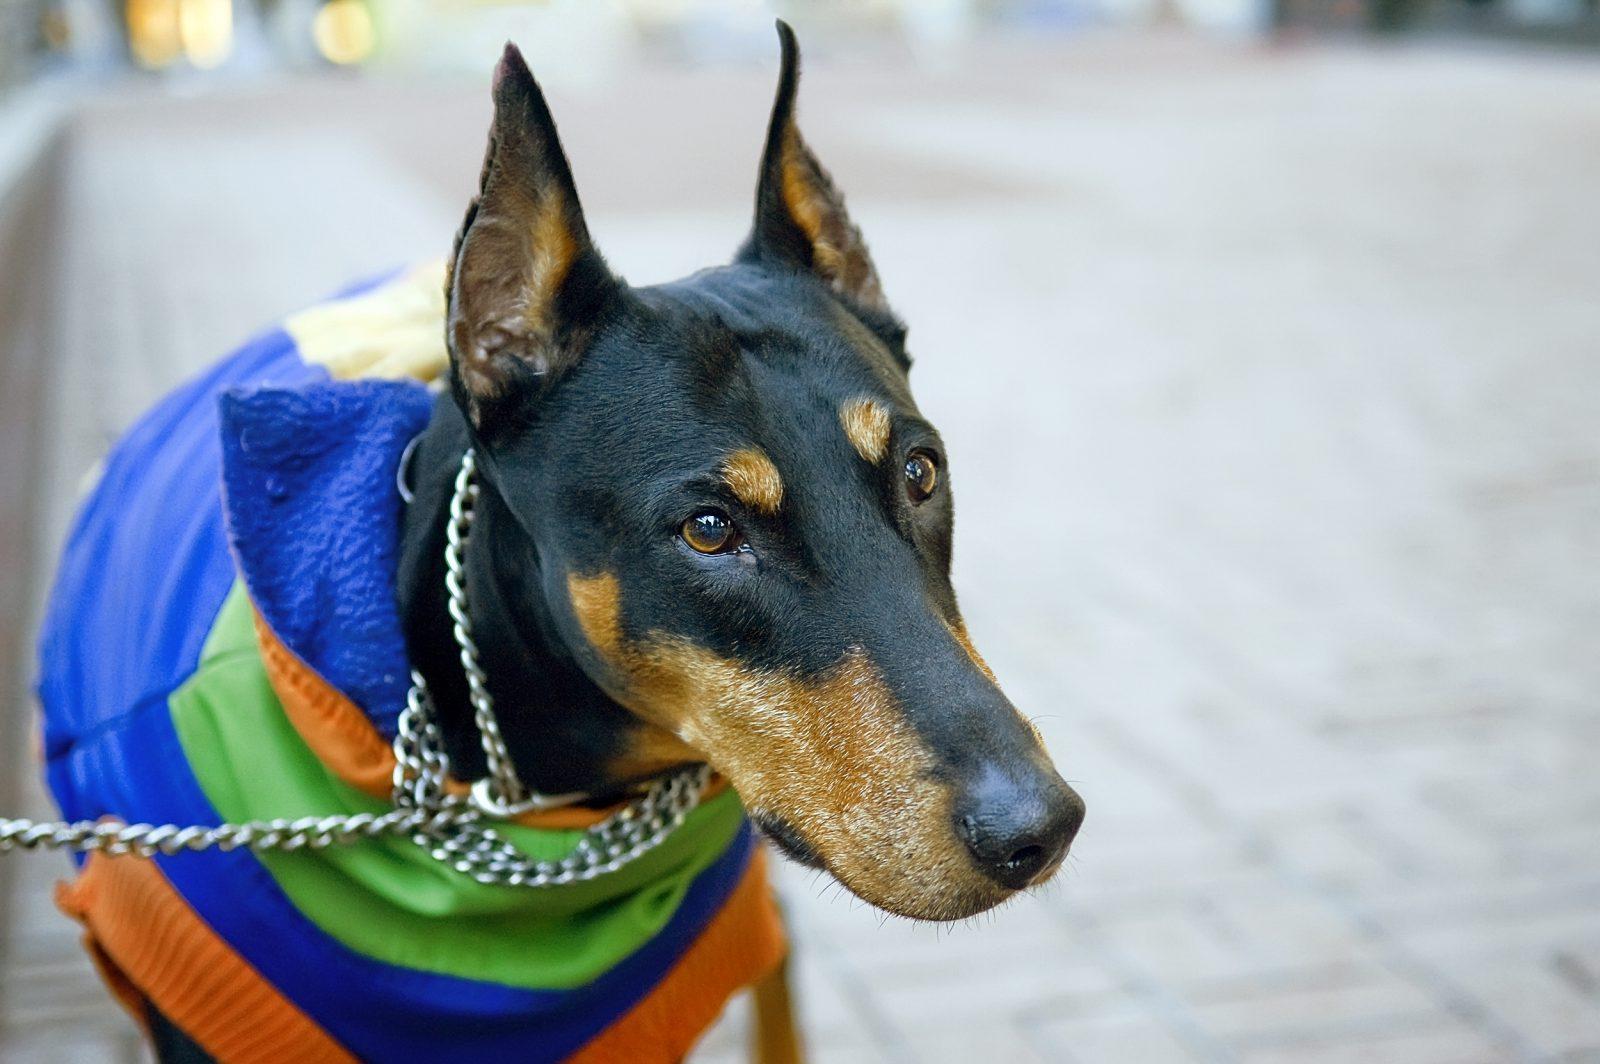 Cachorro latindo: Doberman adulto passeando de coleira e roupa fashion.